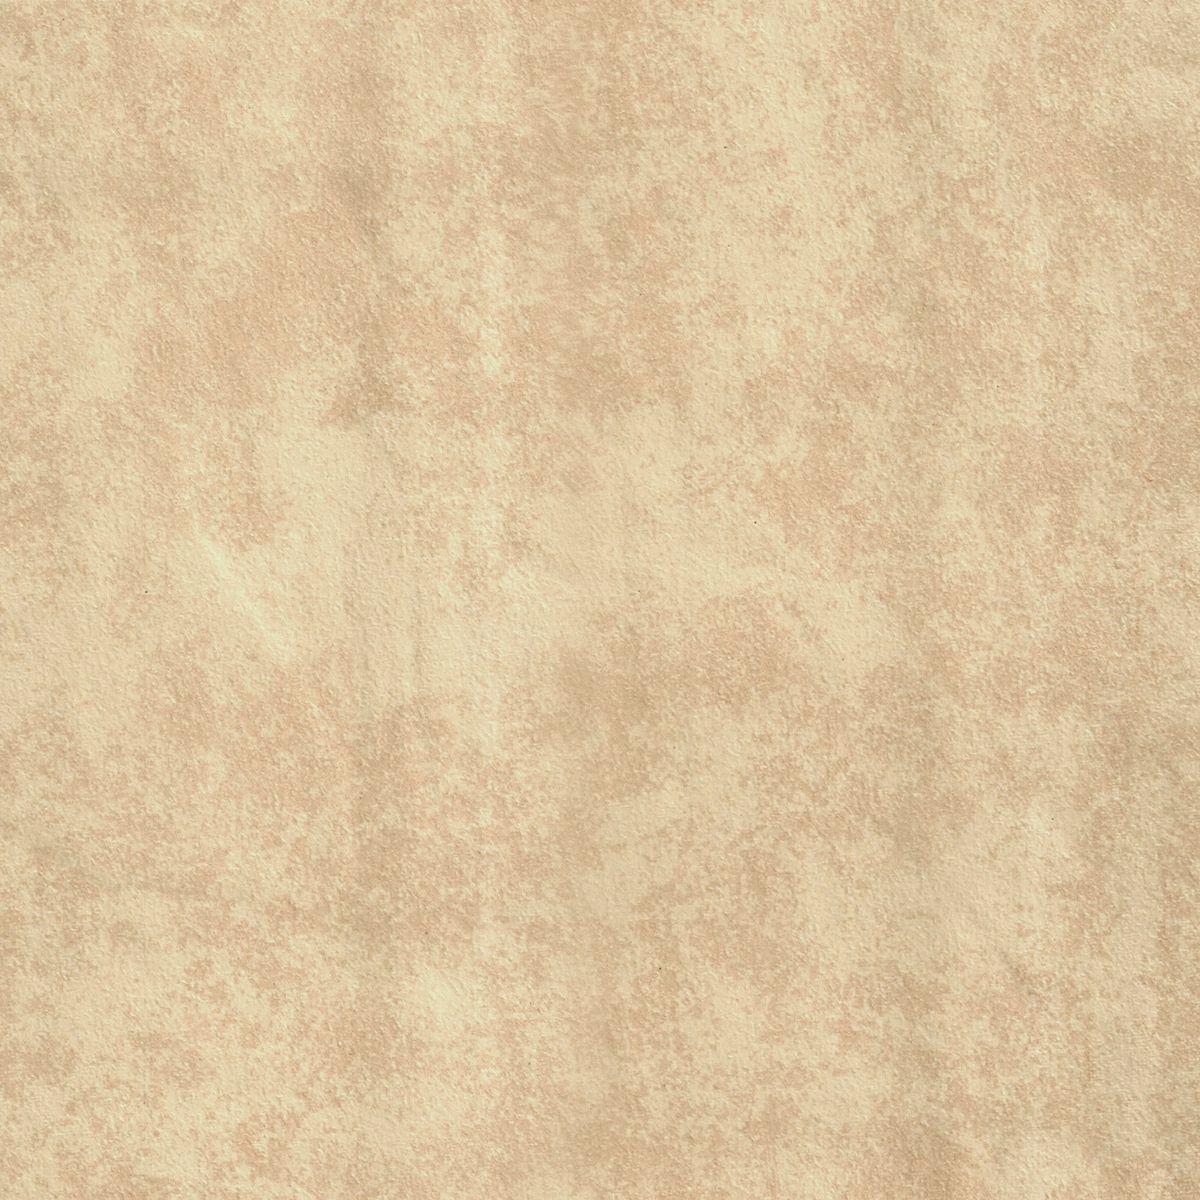 Pretty 12 X 12 Ceramic Tile Thick 12X12 Vinyl Floor Tile Round 12X24 Floor Tile Patterns 24 X 48 Ceiling Tiles Drop Ceiling Youthful 3 X 12 Subway Tile Fresh3D Floor Tiles KWIK TILE 13x13 Boulder Beige Easy Click Installation Ceramic Tile ..